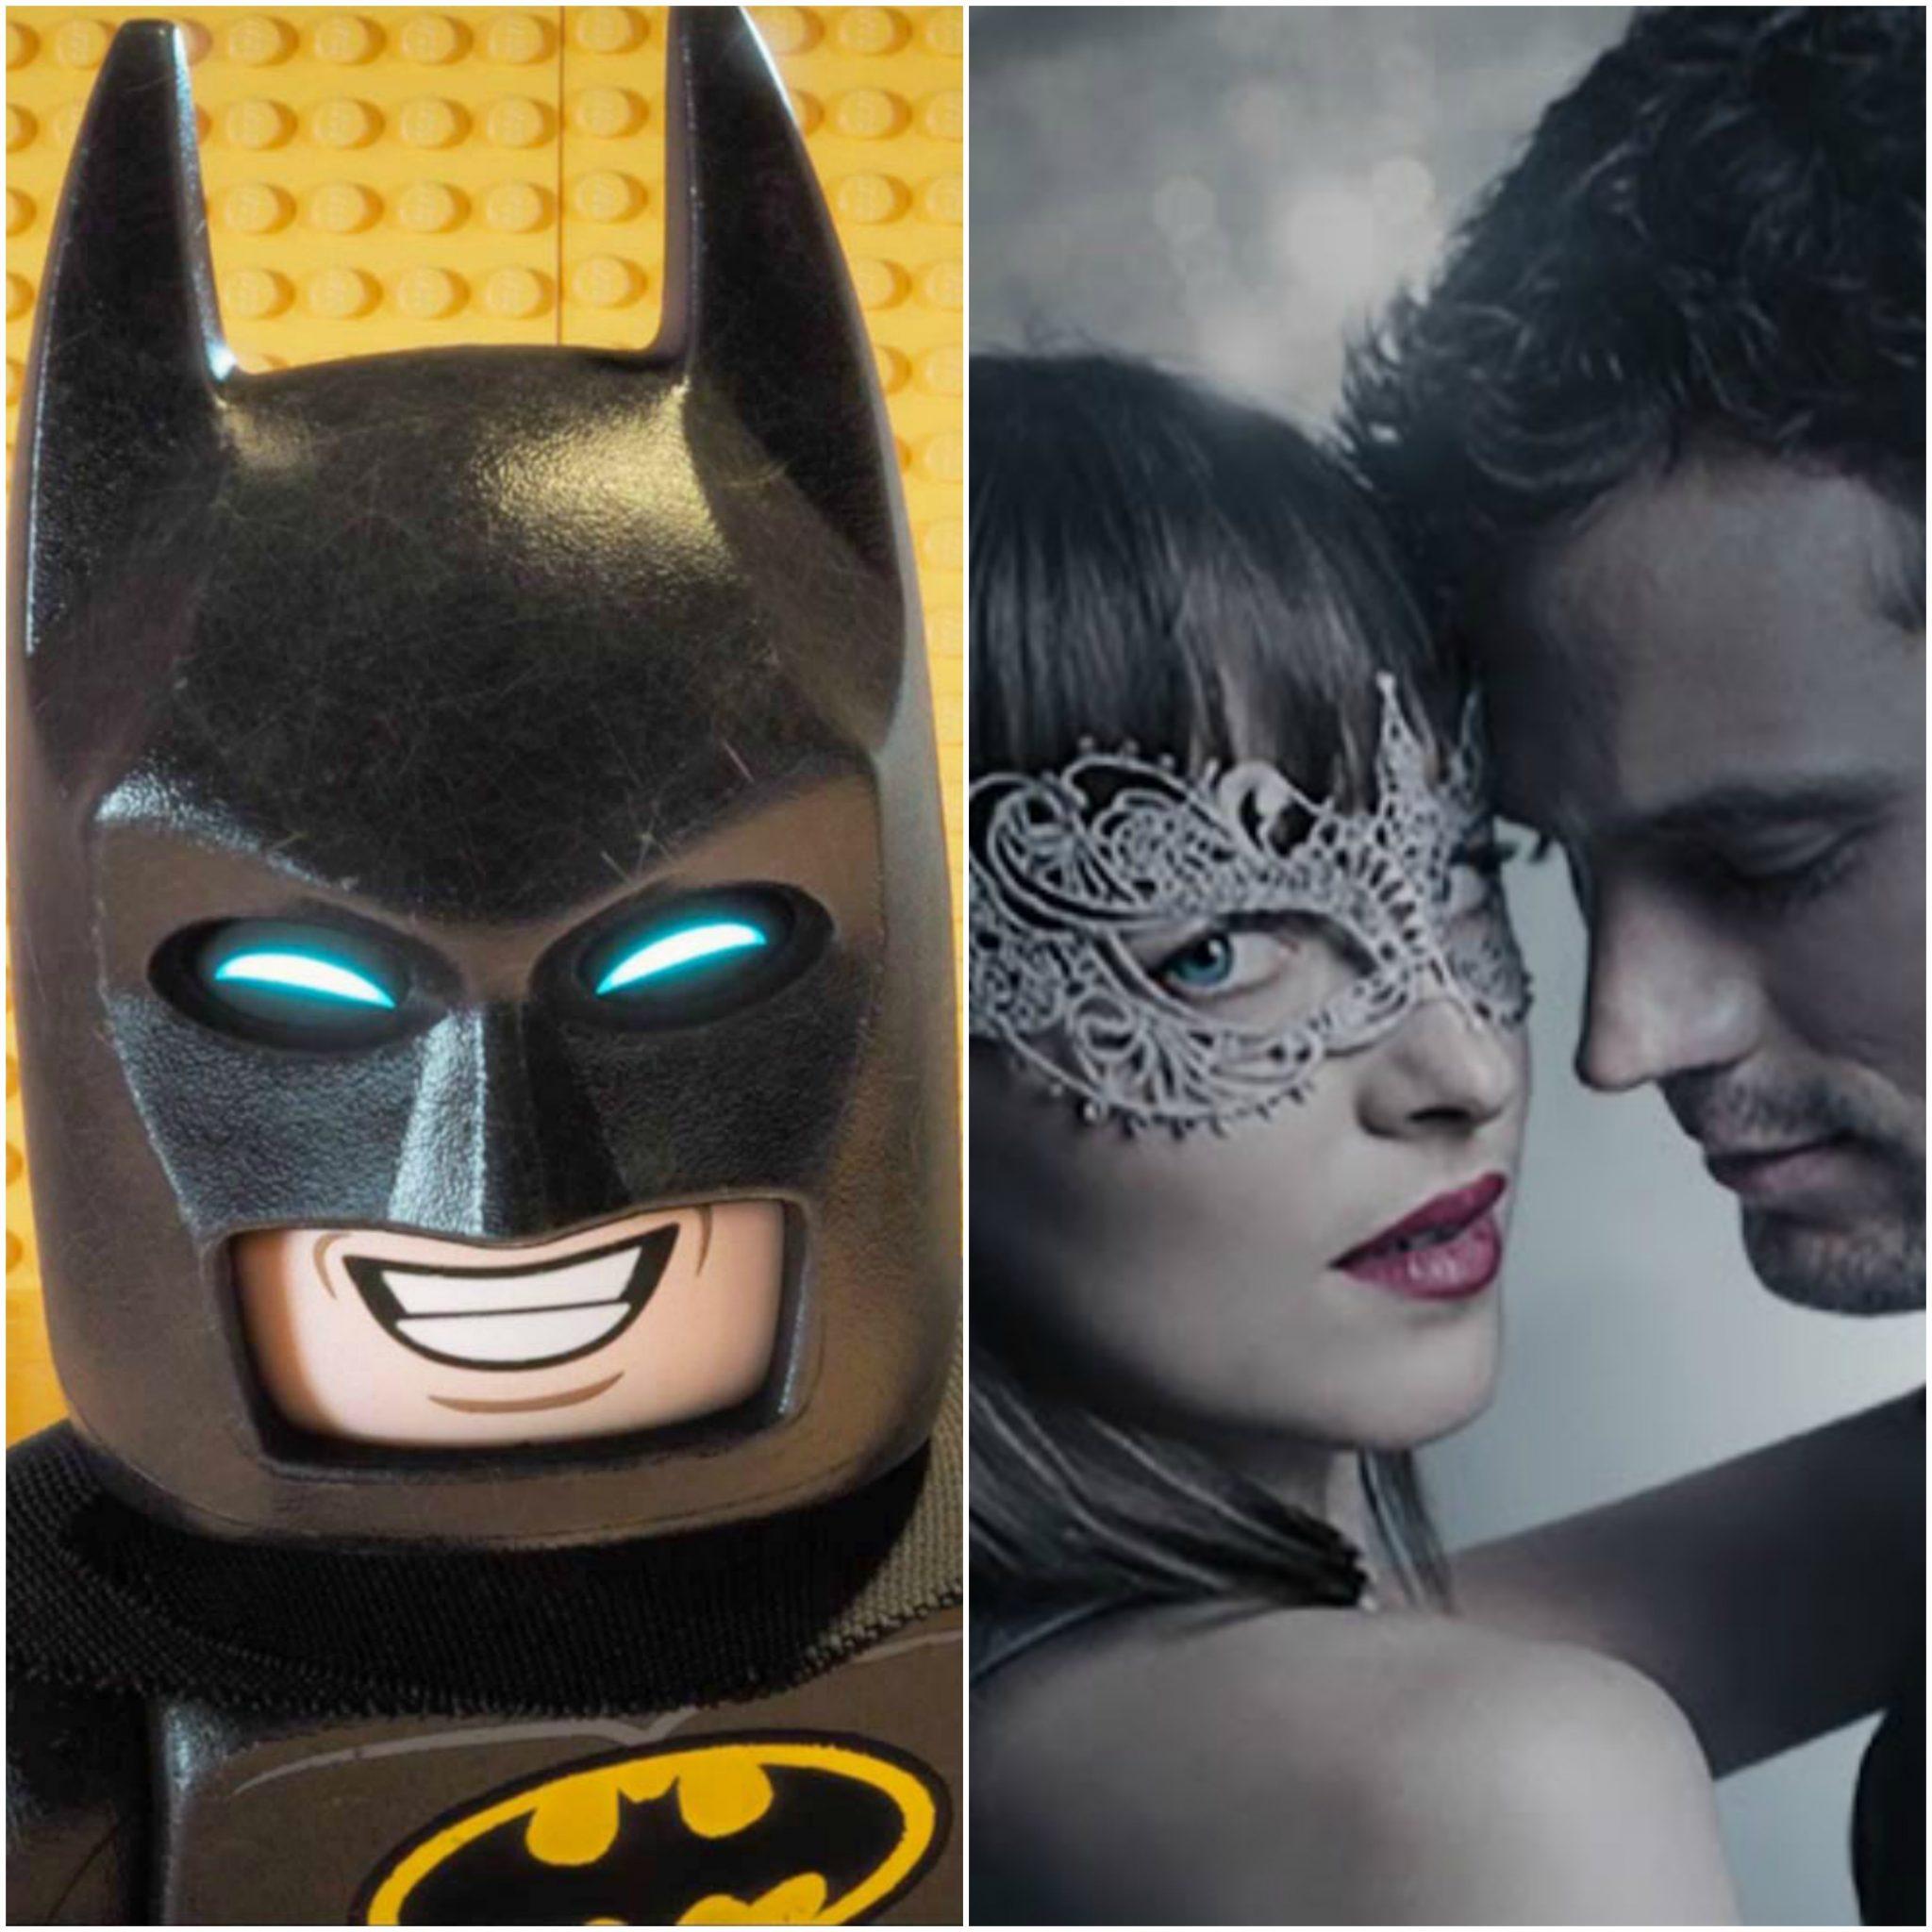 lego-batman-fifty-shades-mashup2